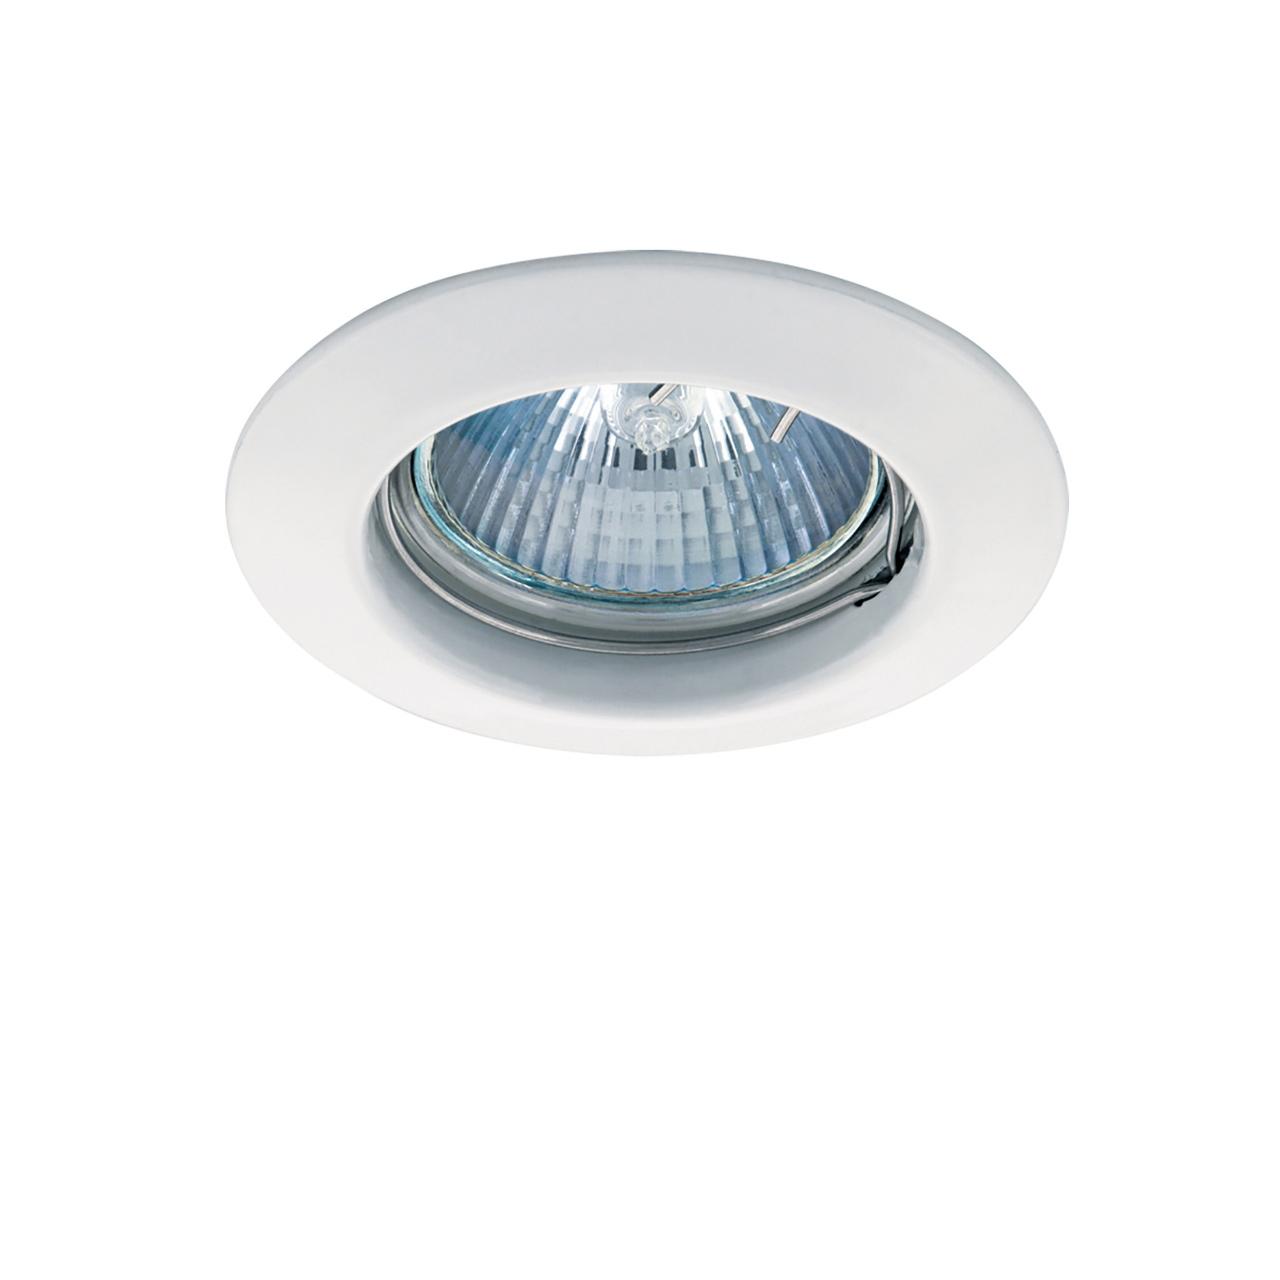 Светильник lega HI FIX MR16 / HP16 белый Lightstar 011010